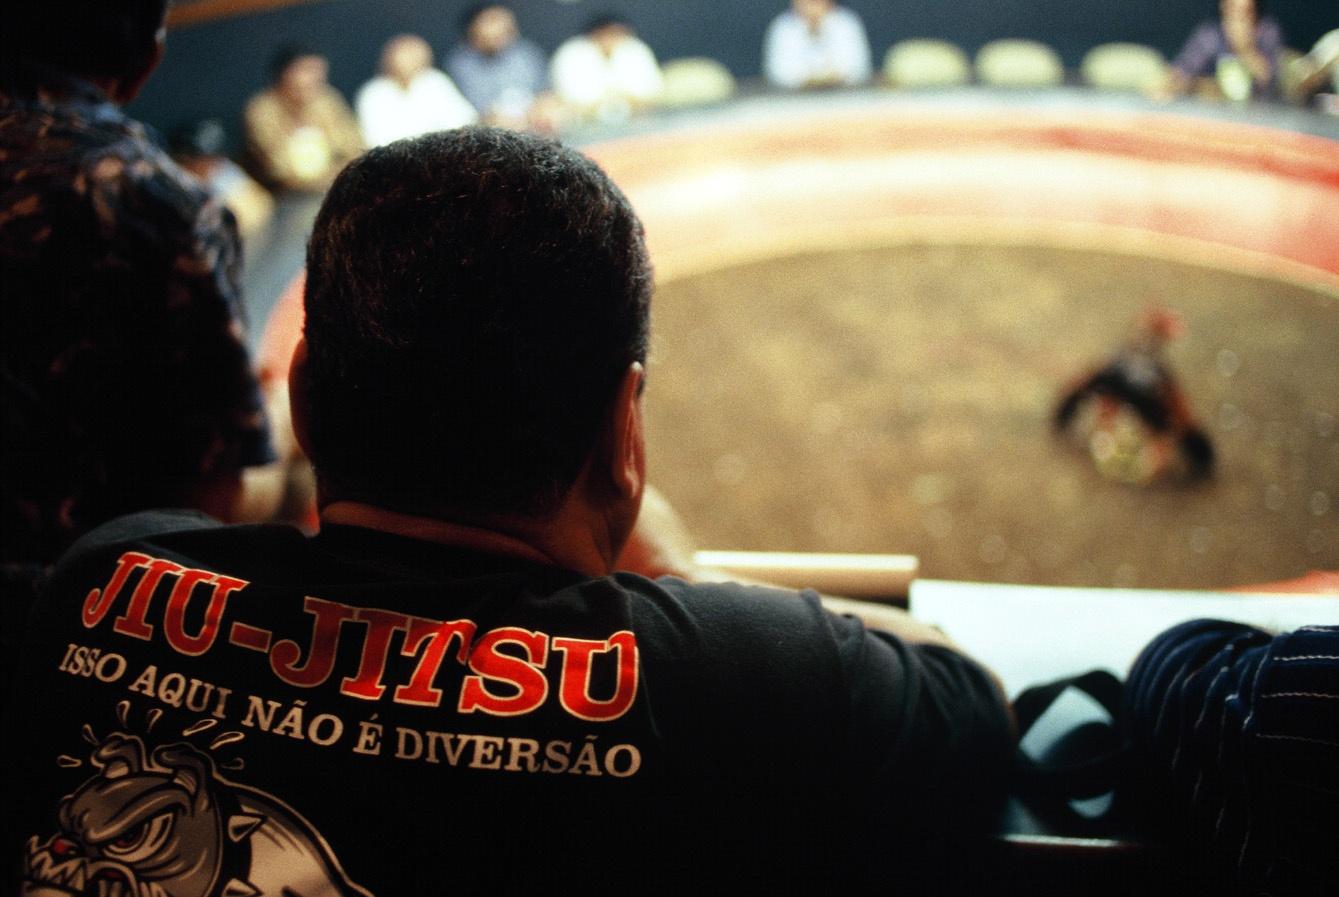 Carlson observando uma briga no suntuoso clube de casa de galos no Rio - Foto: Marcelo Alonso